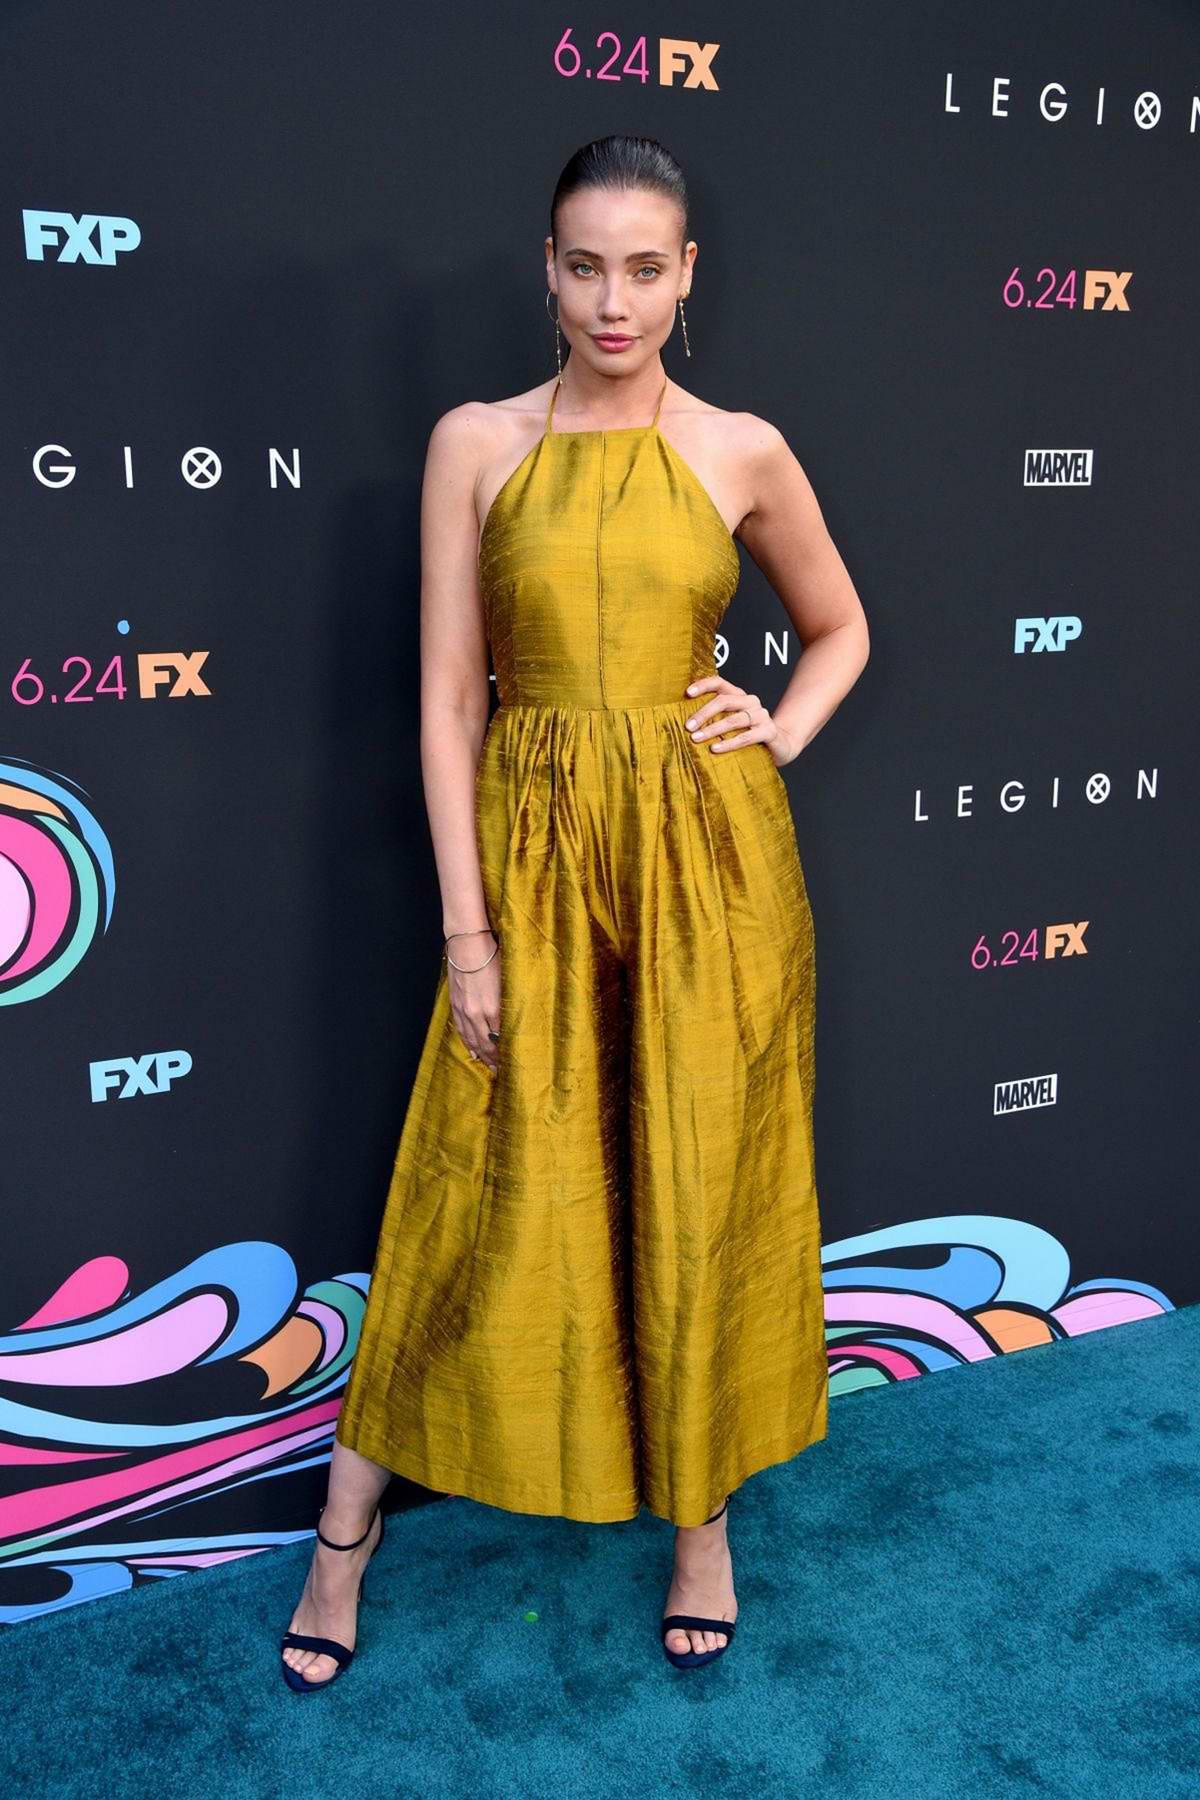 Stephanie Corneliussen attends the Premiere of FX's 'Legion' Season 3 in Hollywood, California